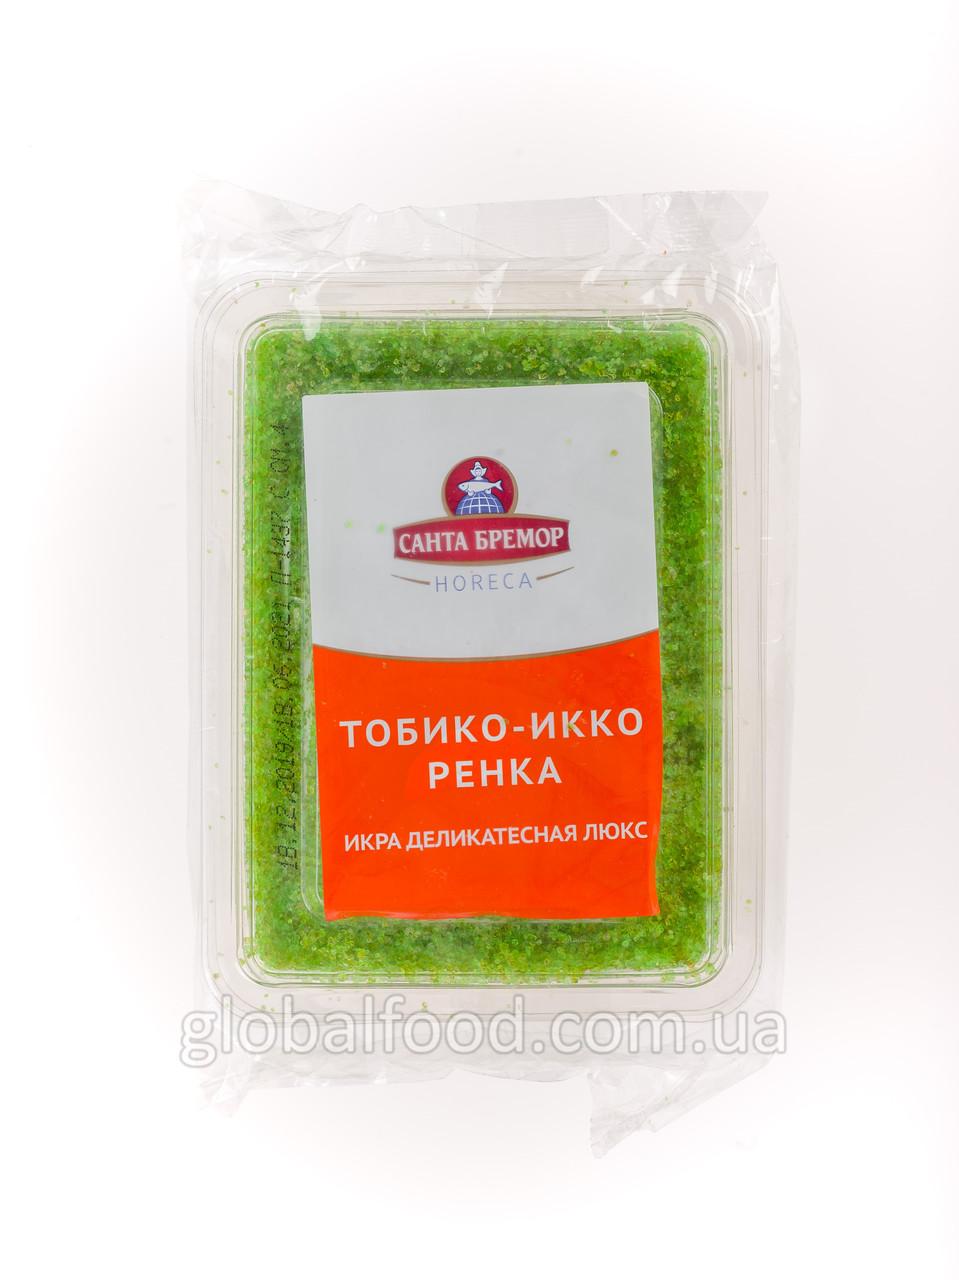 Икра Тобико Санта Бремор Зеленая 0,5кг